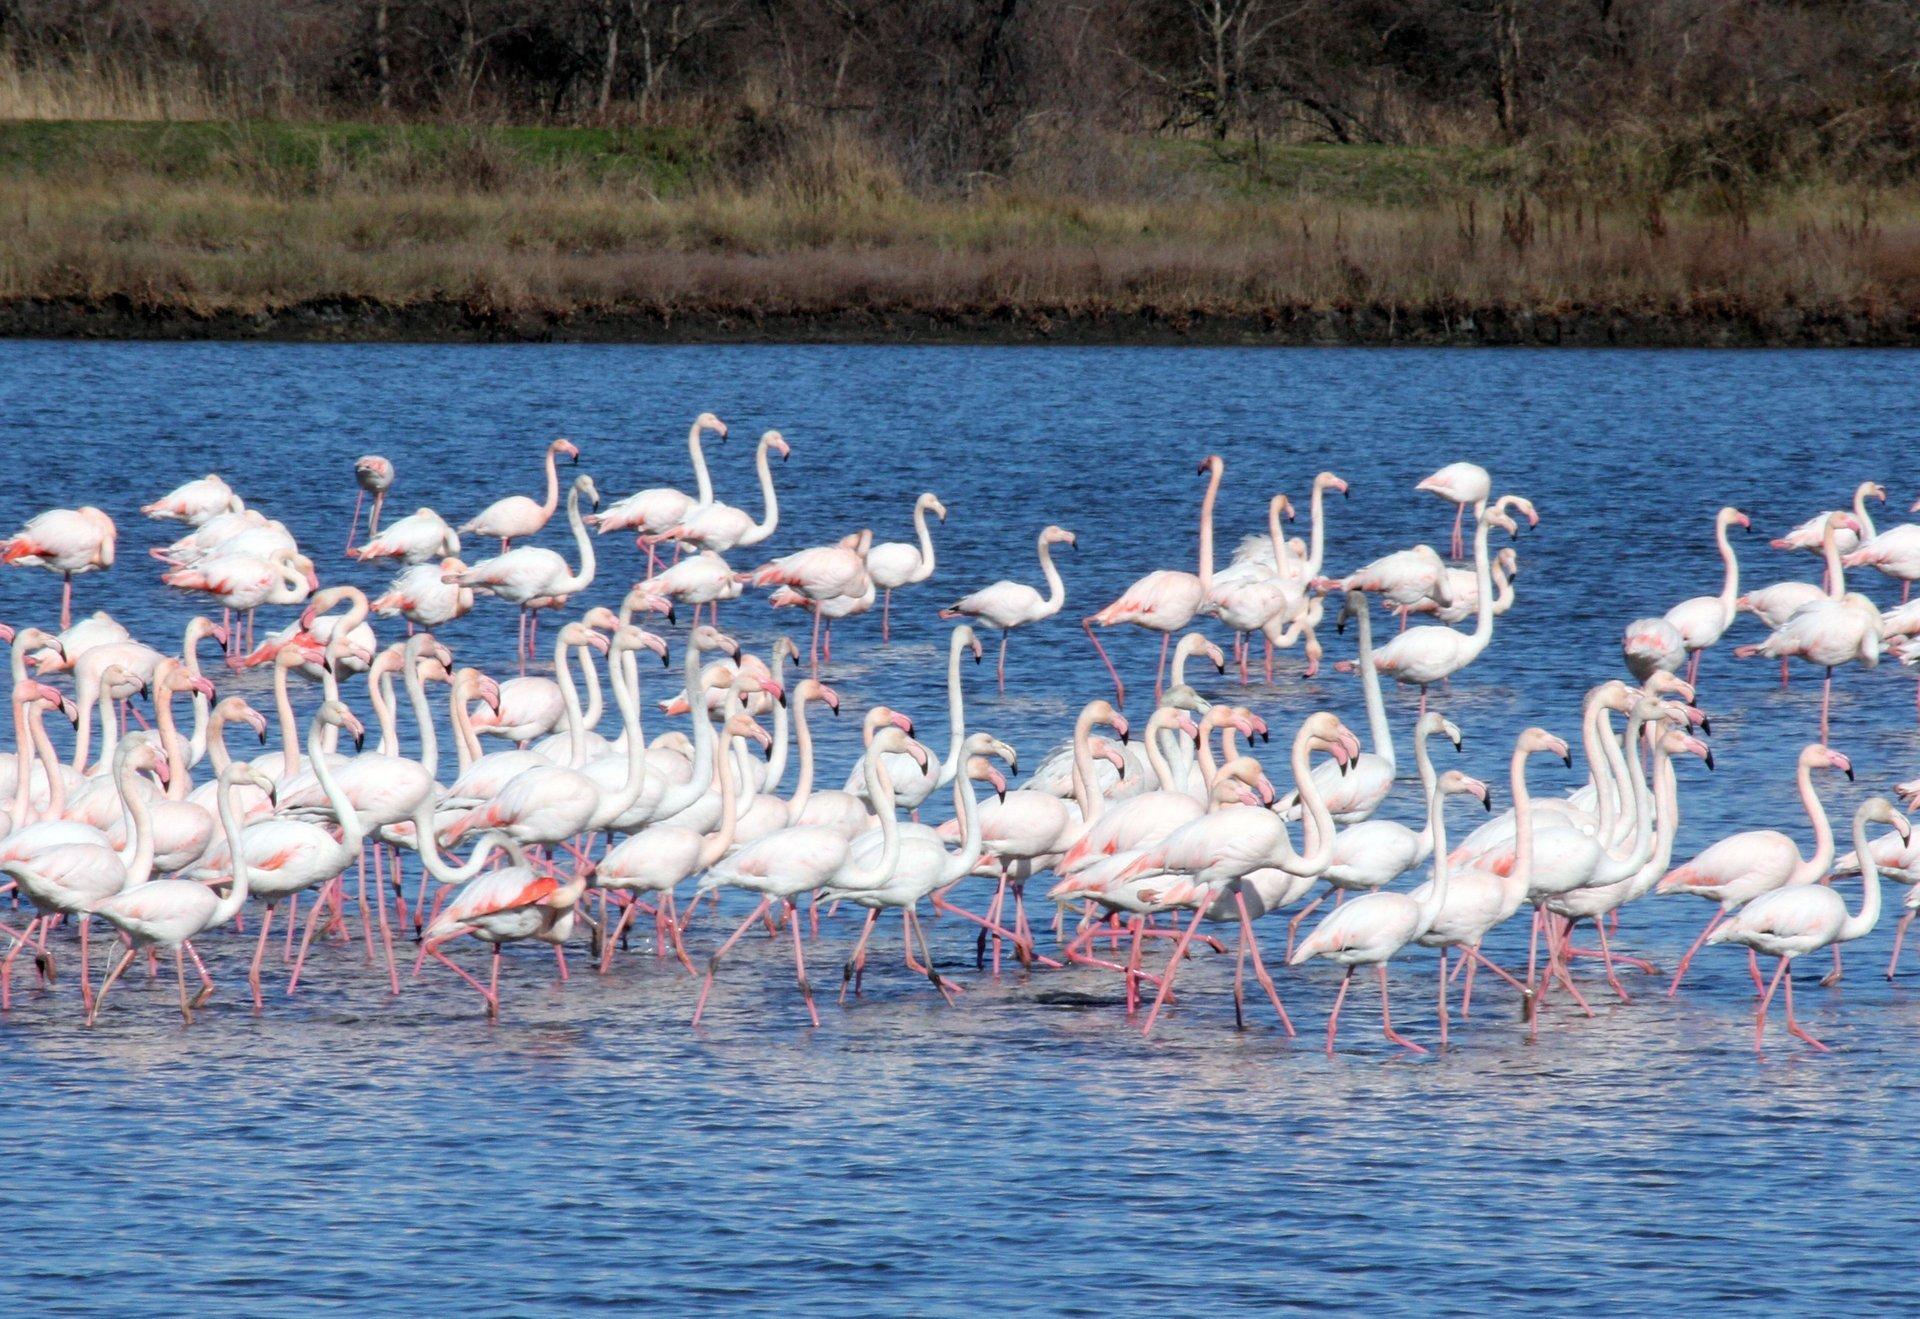 Flamingoes in Ulcinj in Montenegro 2019 - Best Time